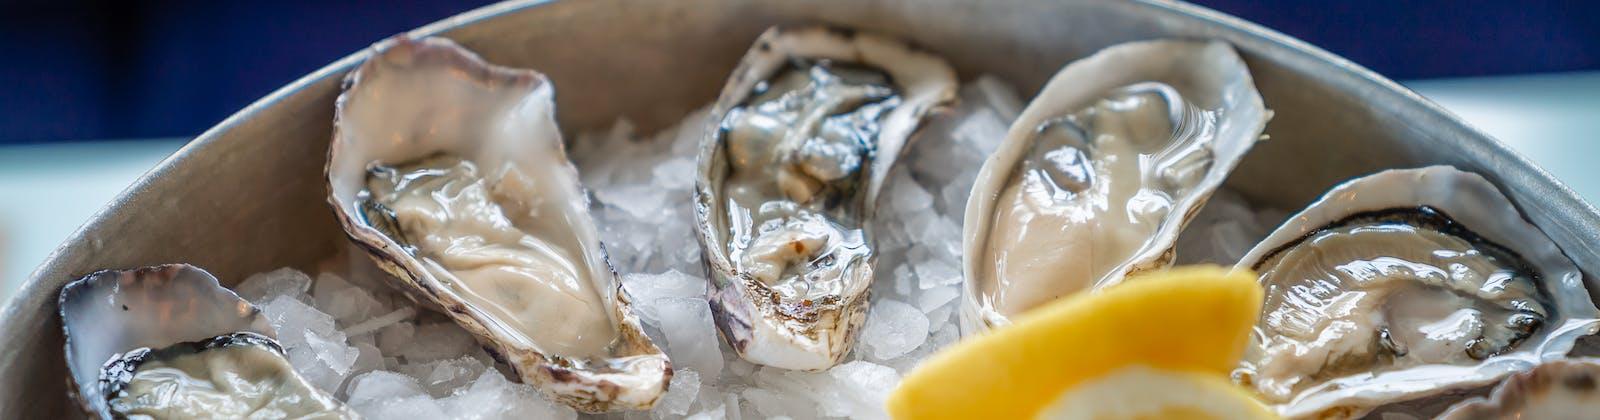 oyster inn oysters